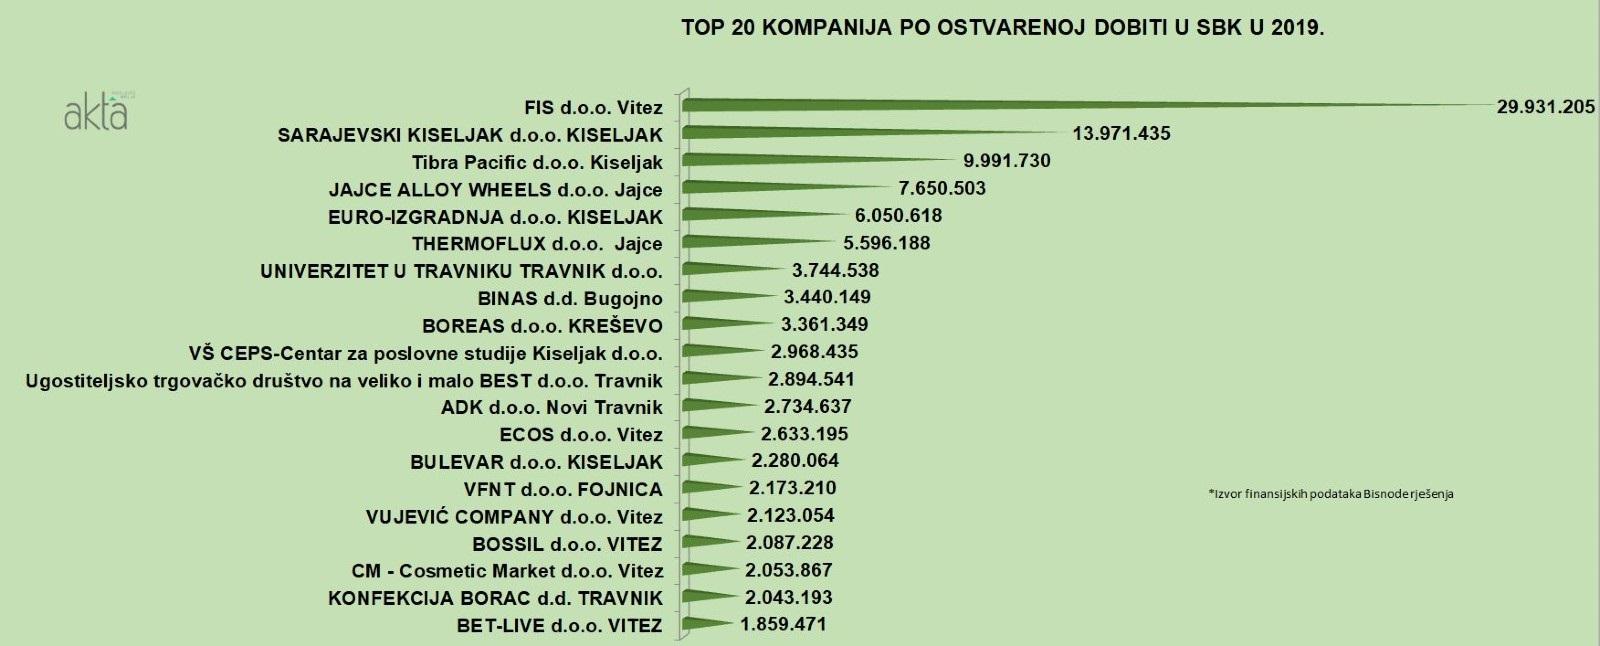 Pogledajte Top 20 kompanija po dobiti, prihodu i broju radnika u SBK